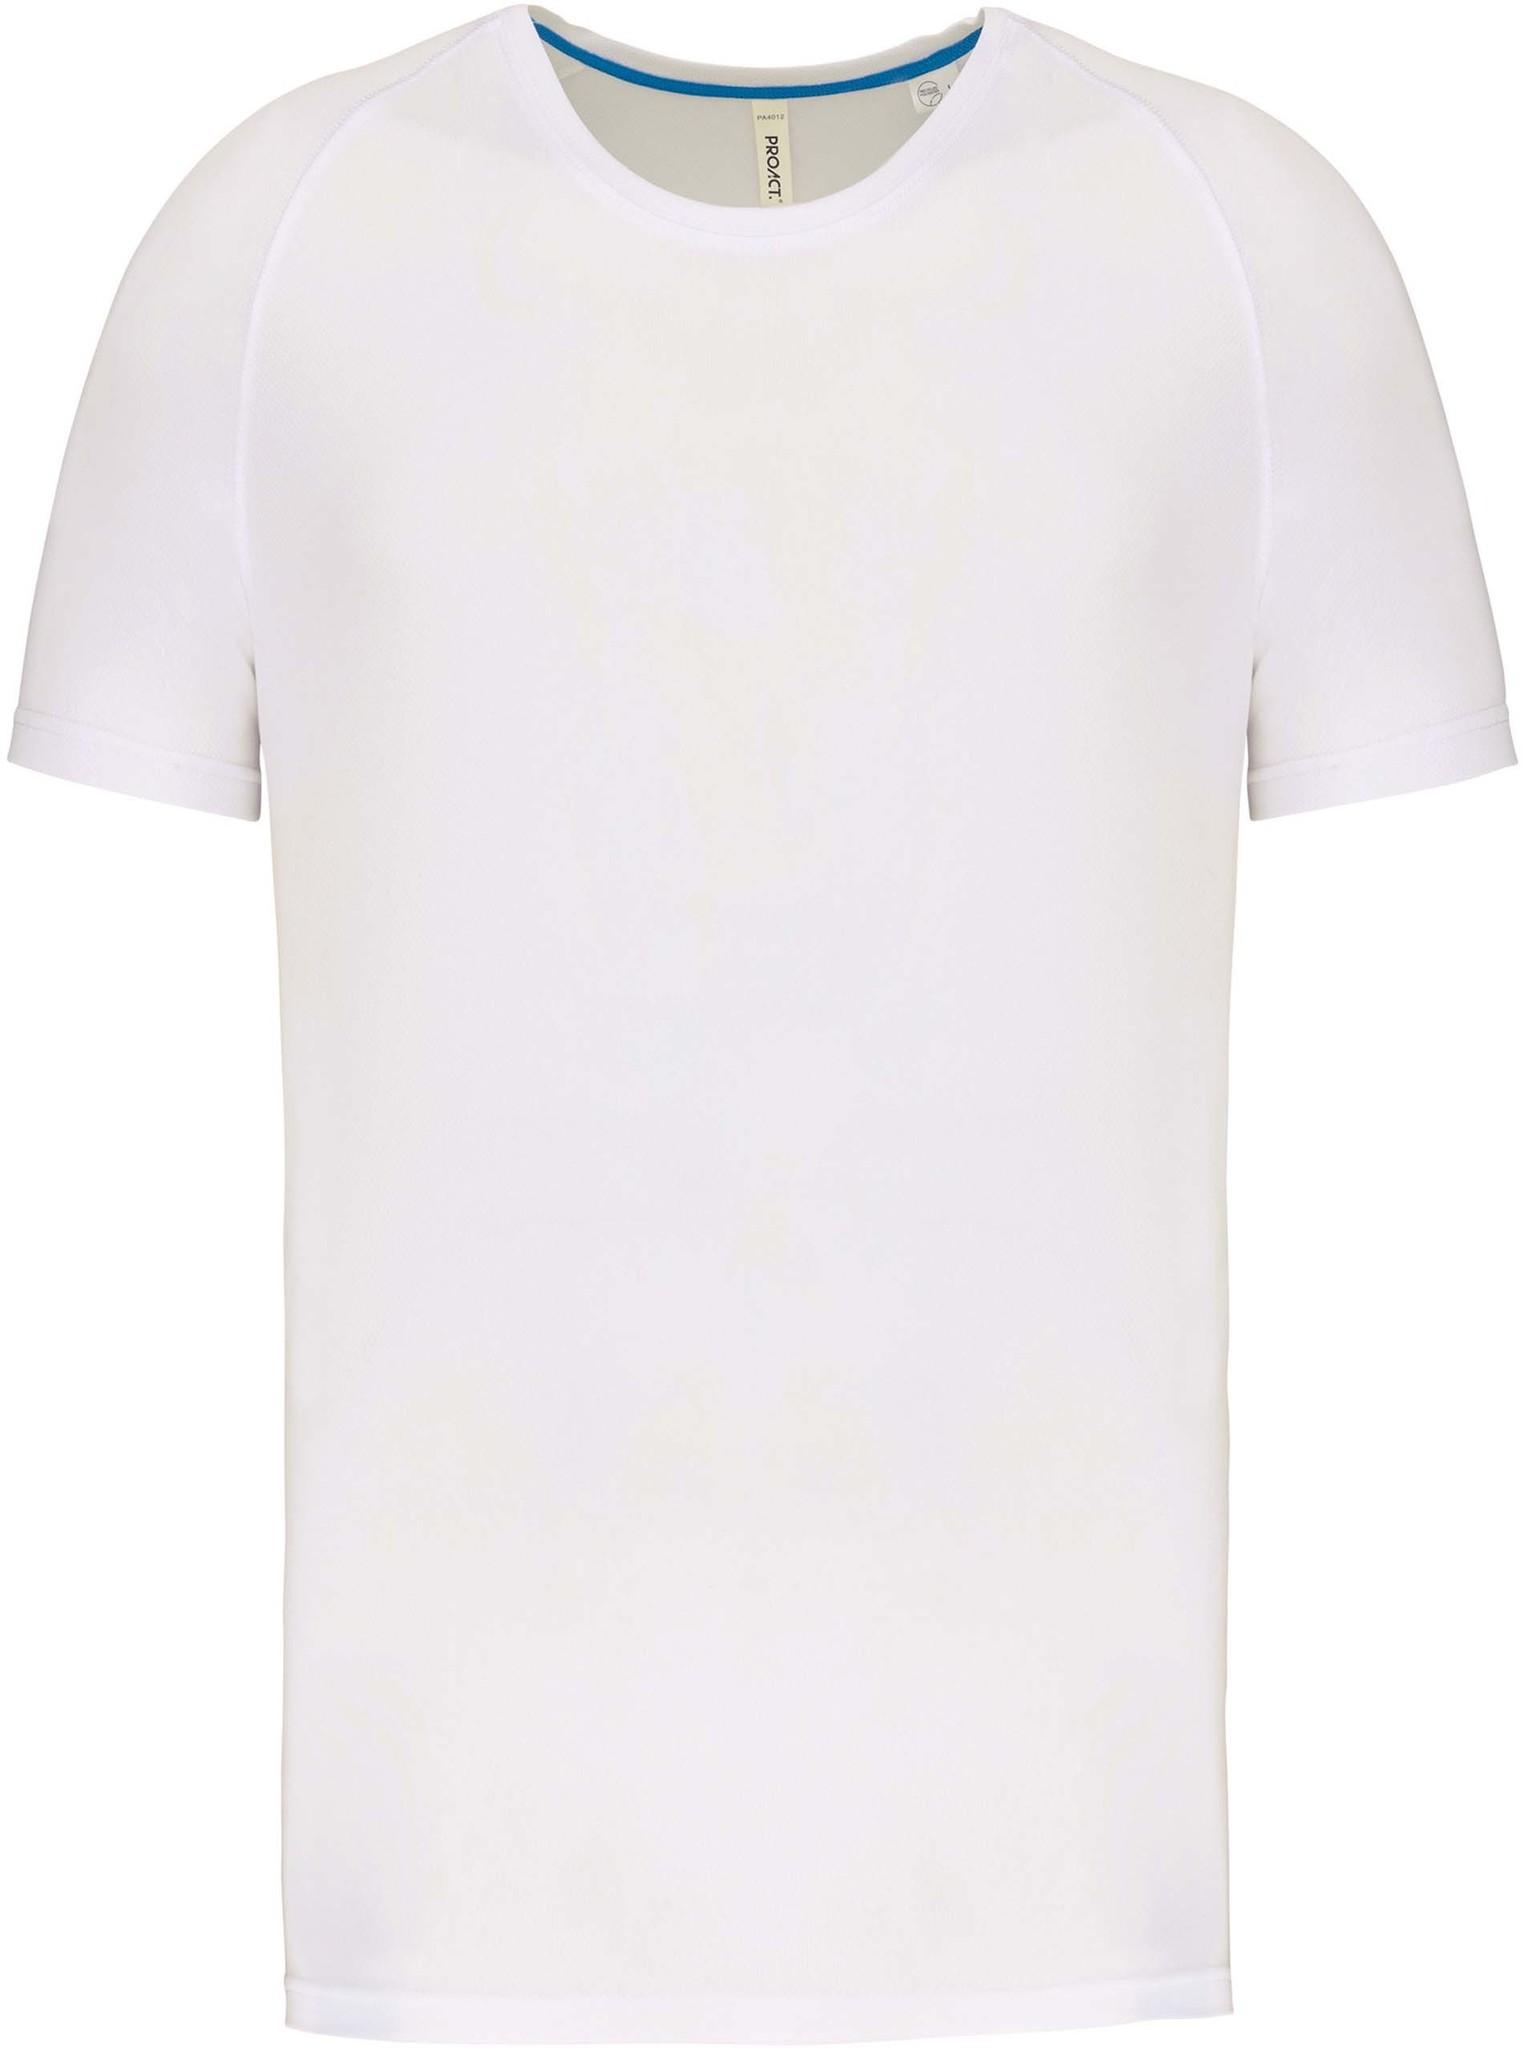 Gerecycled Herensport shirt met ronde hals-Wit